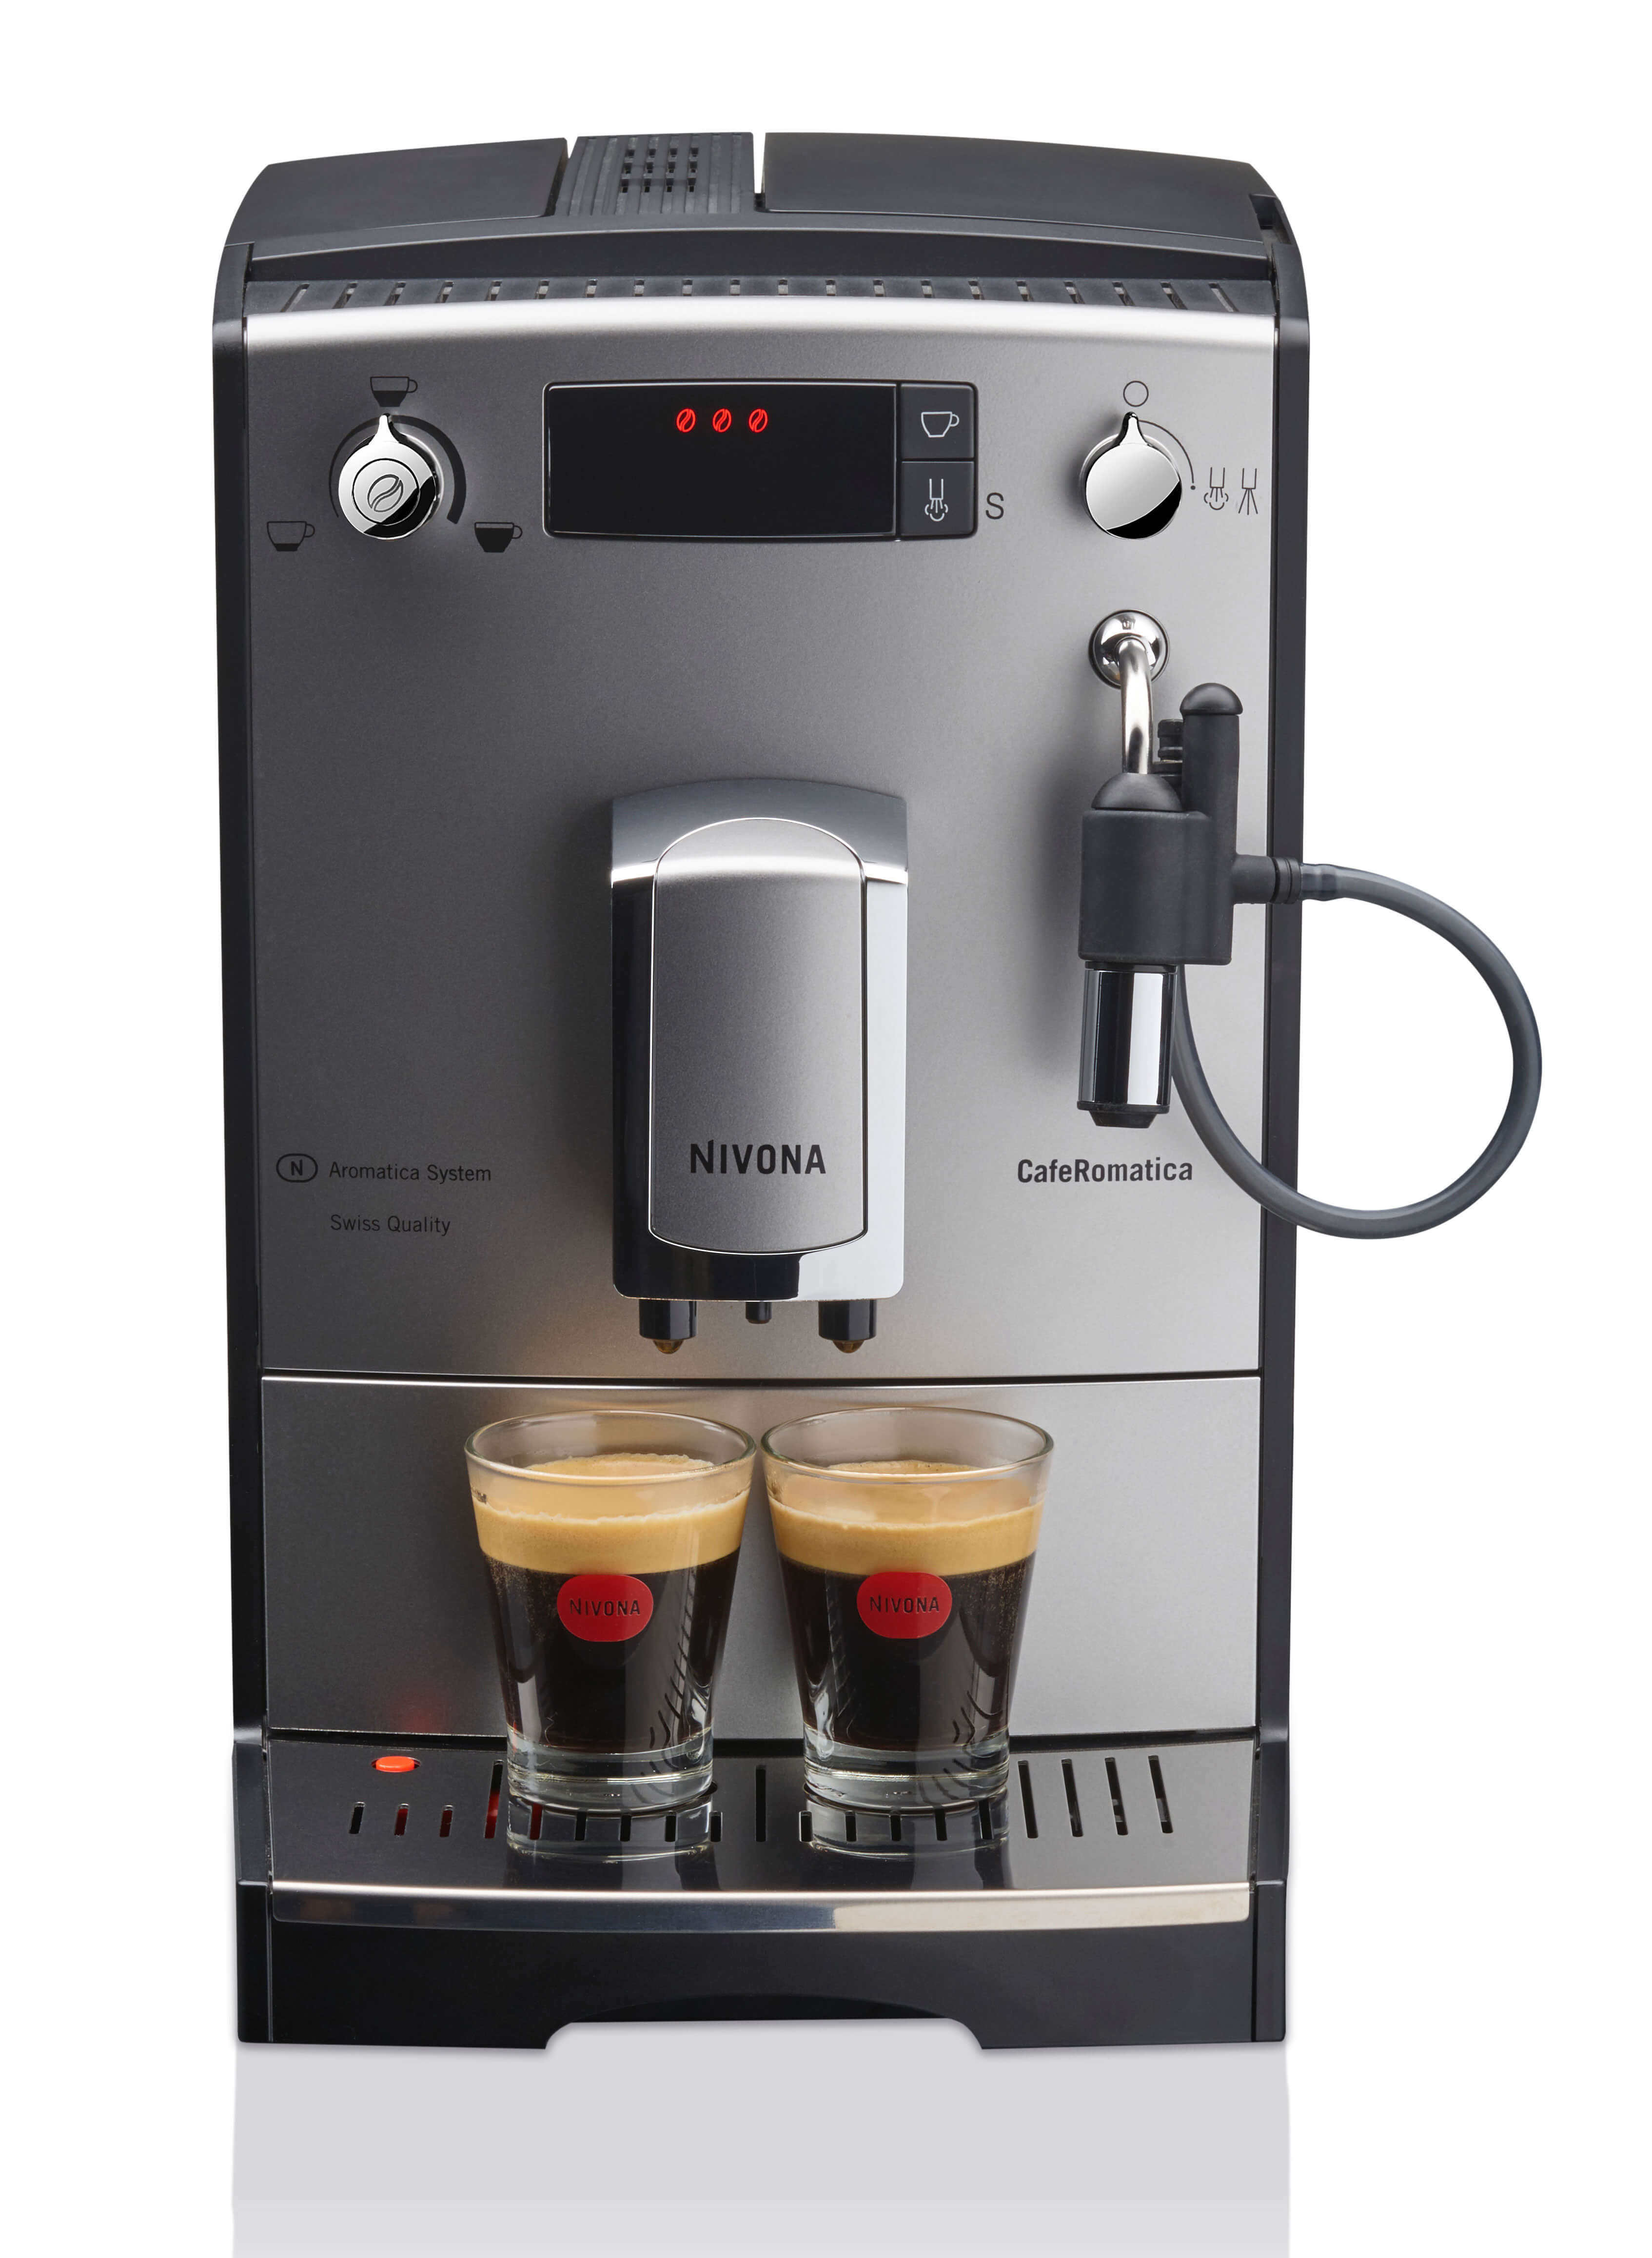 Nivona Kaffeevollautomat Cafe Romantica NICR 530 | Kamasega